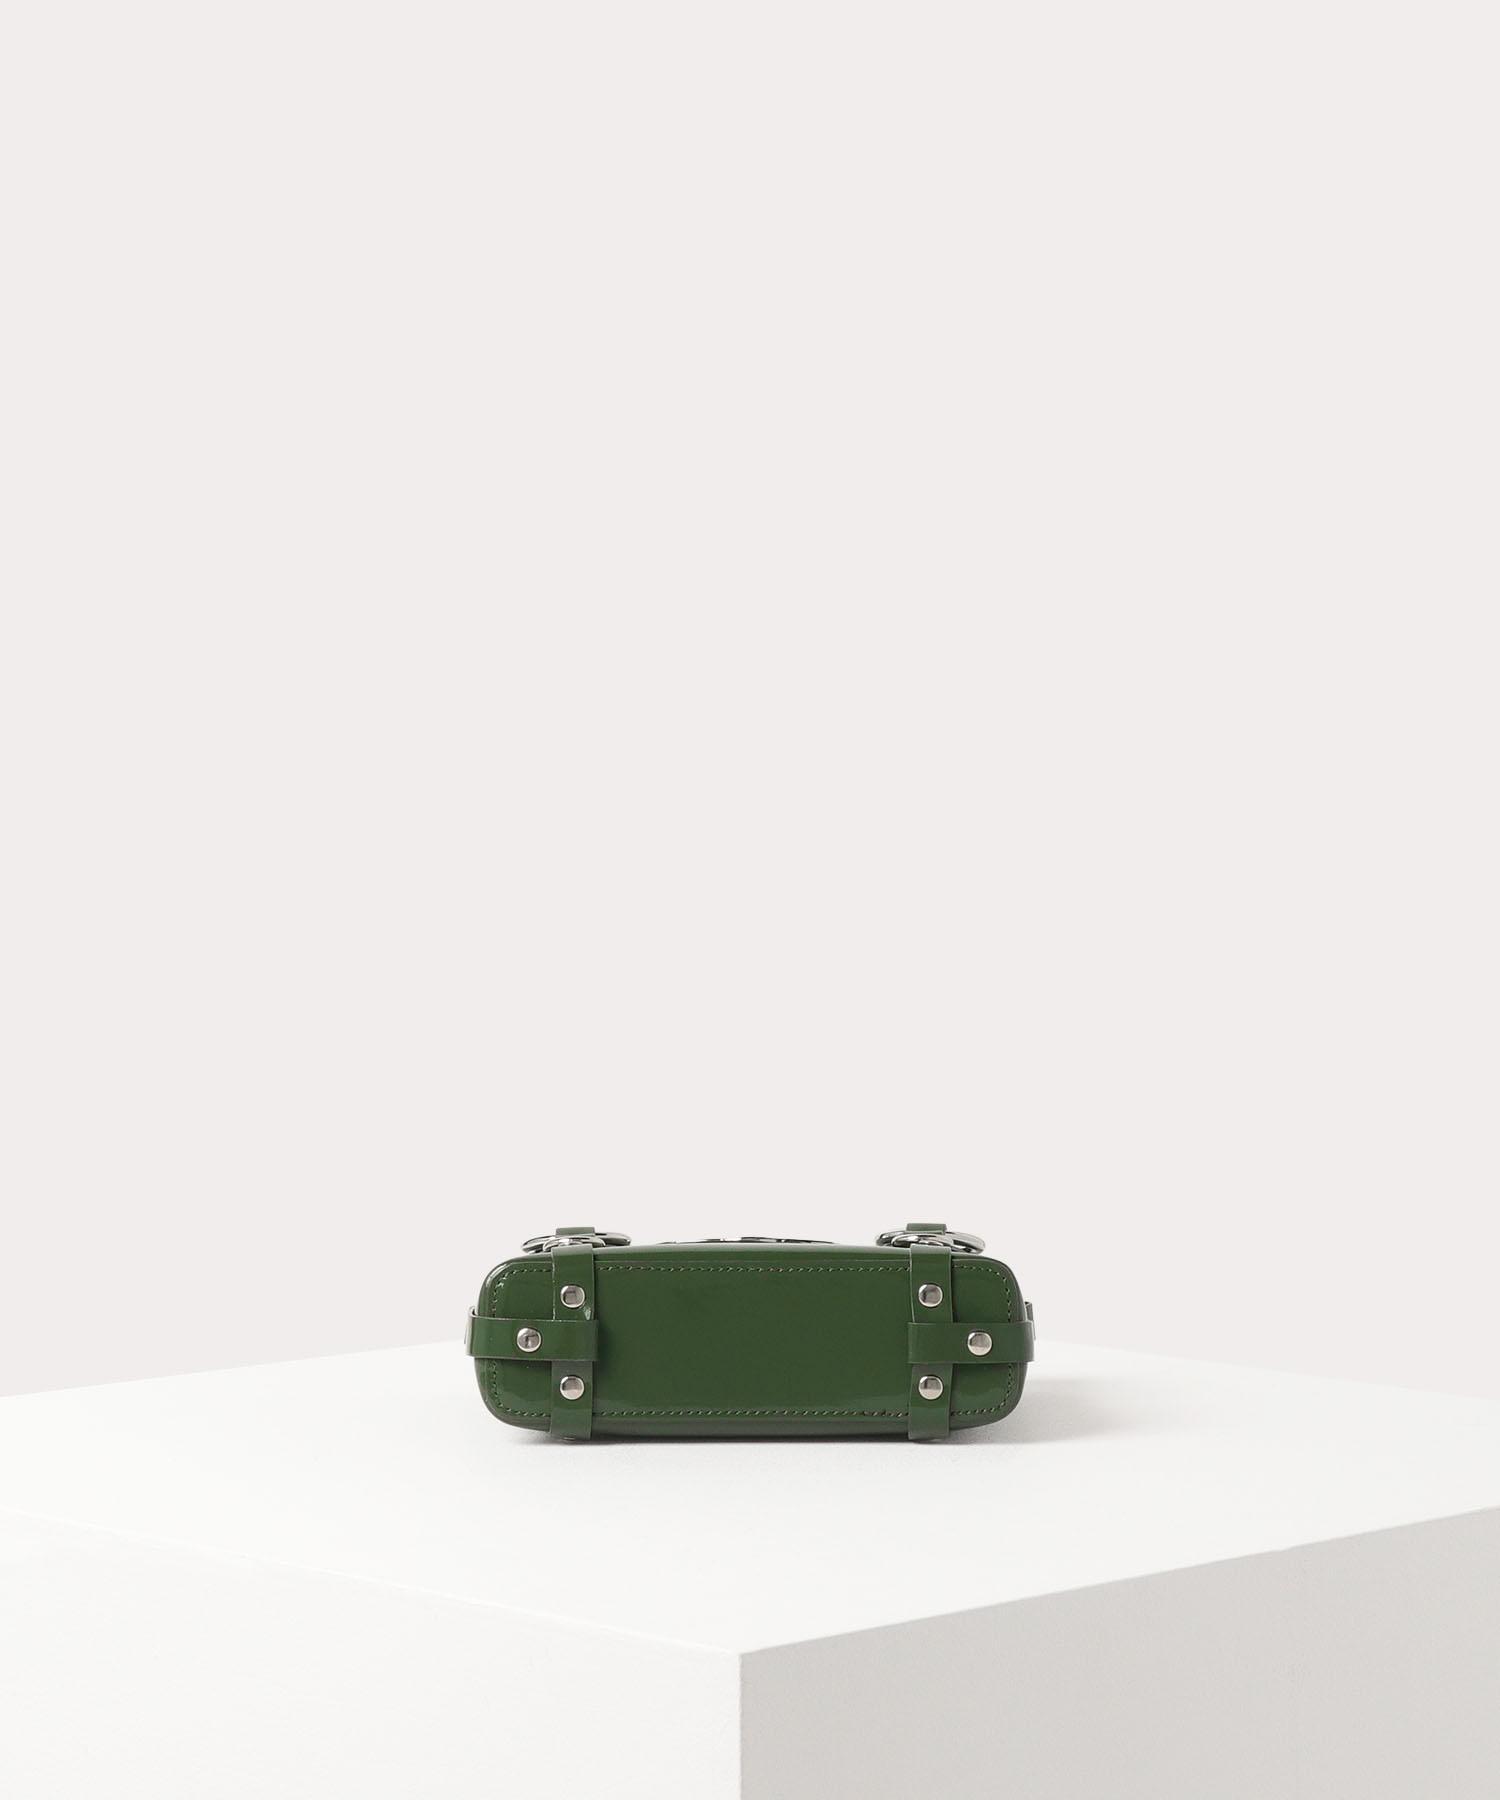 BETTY ミニショルダーバッグ